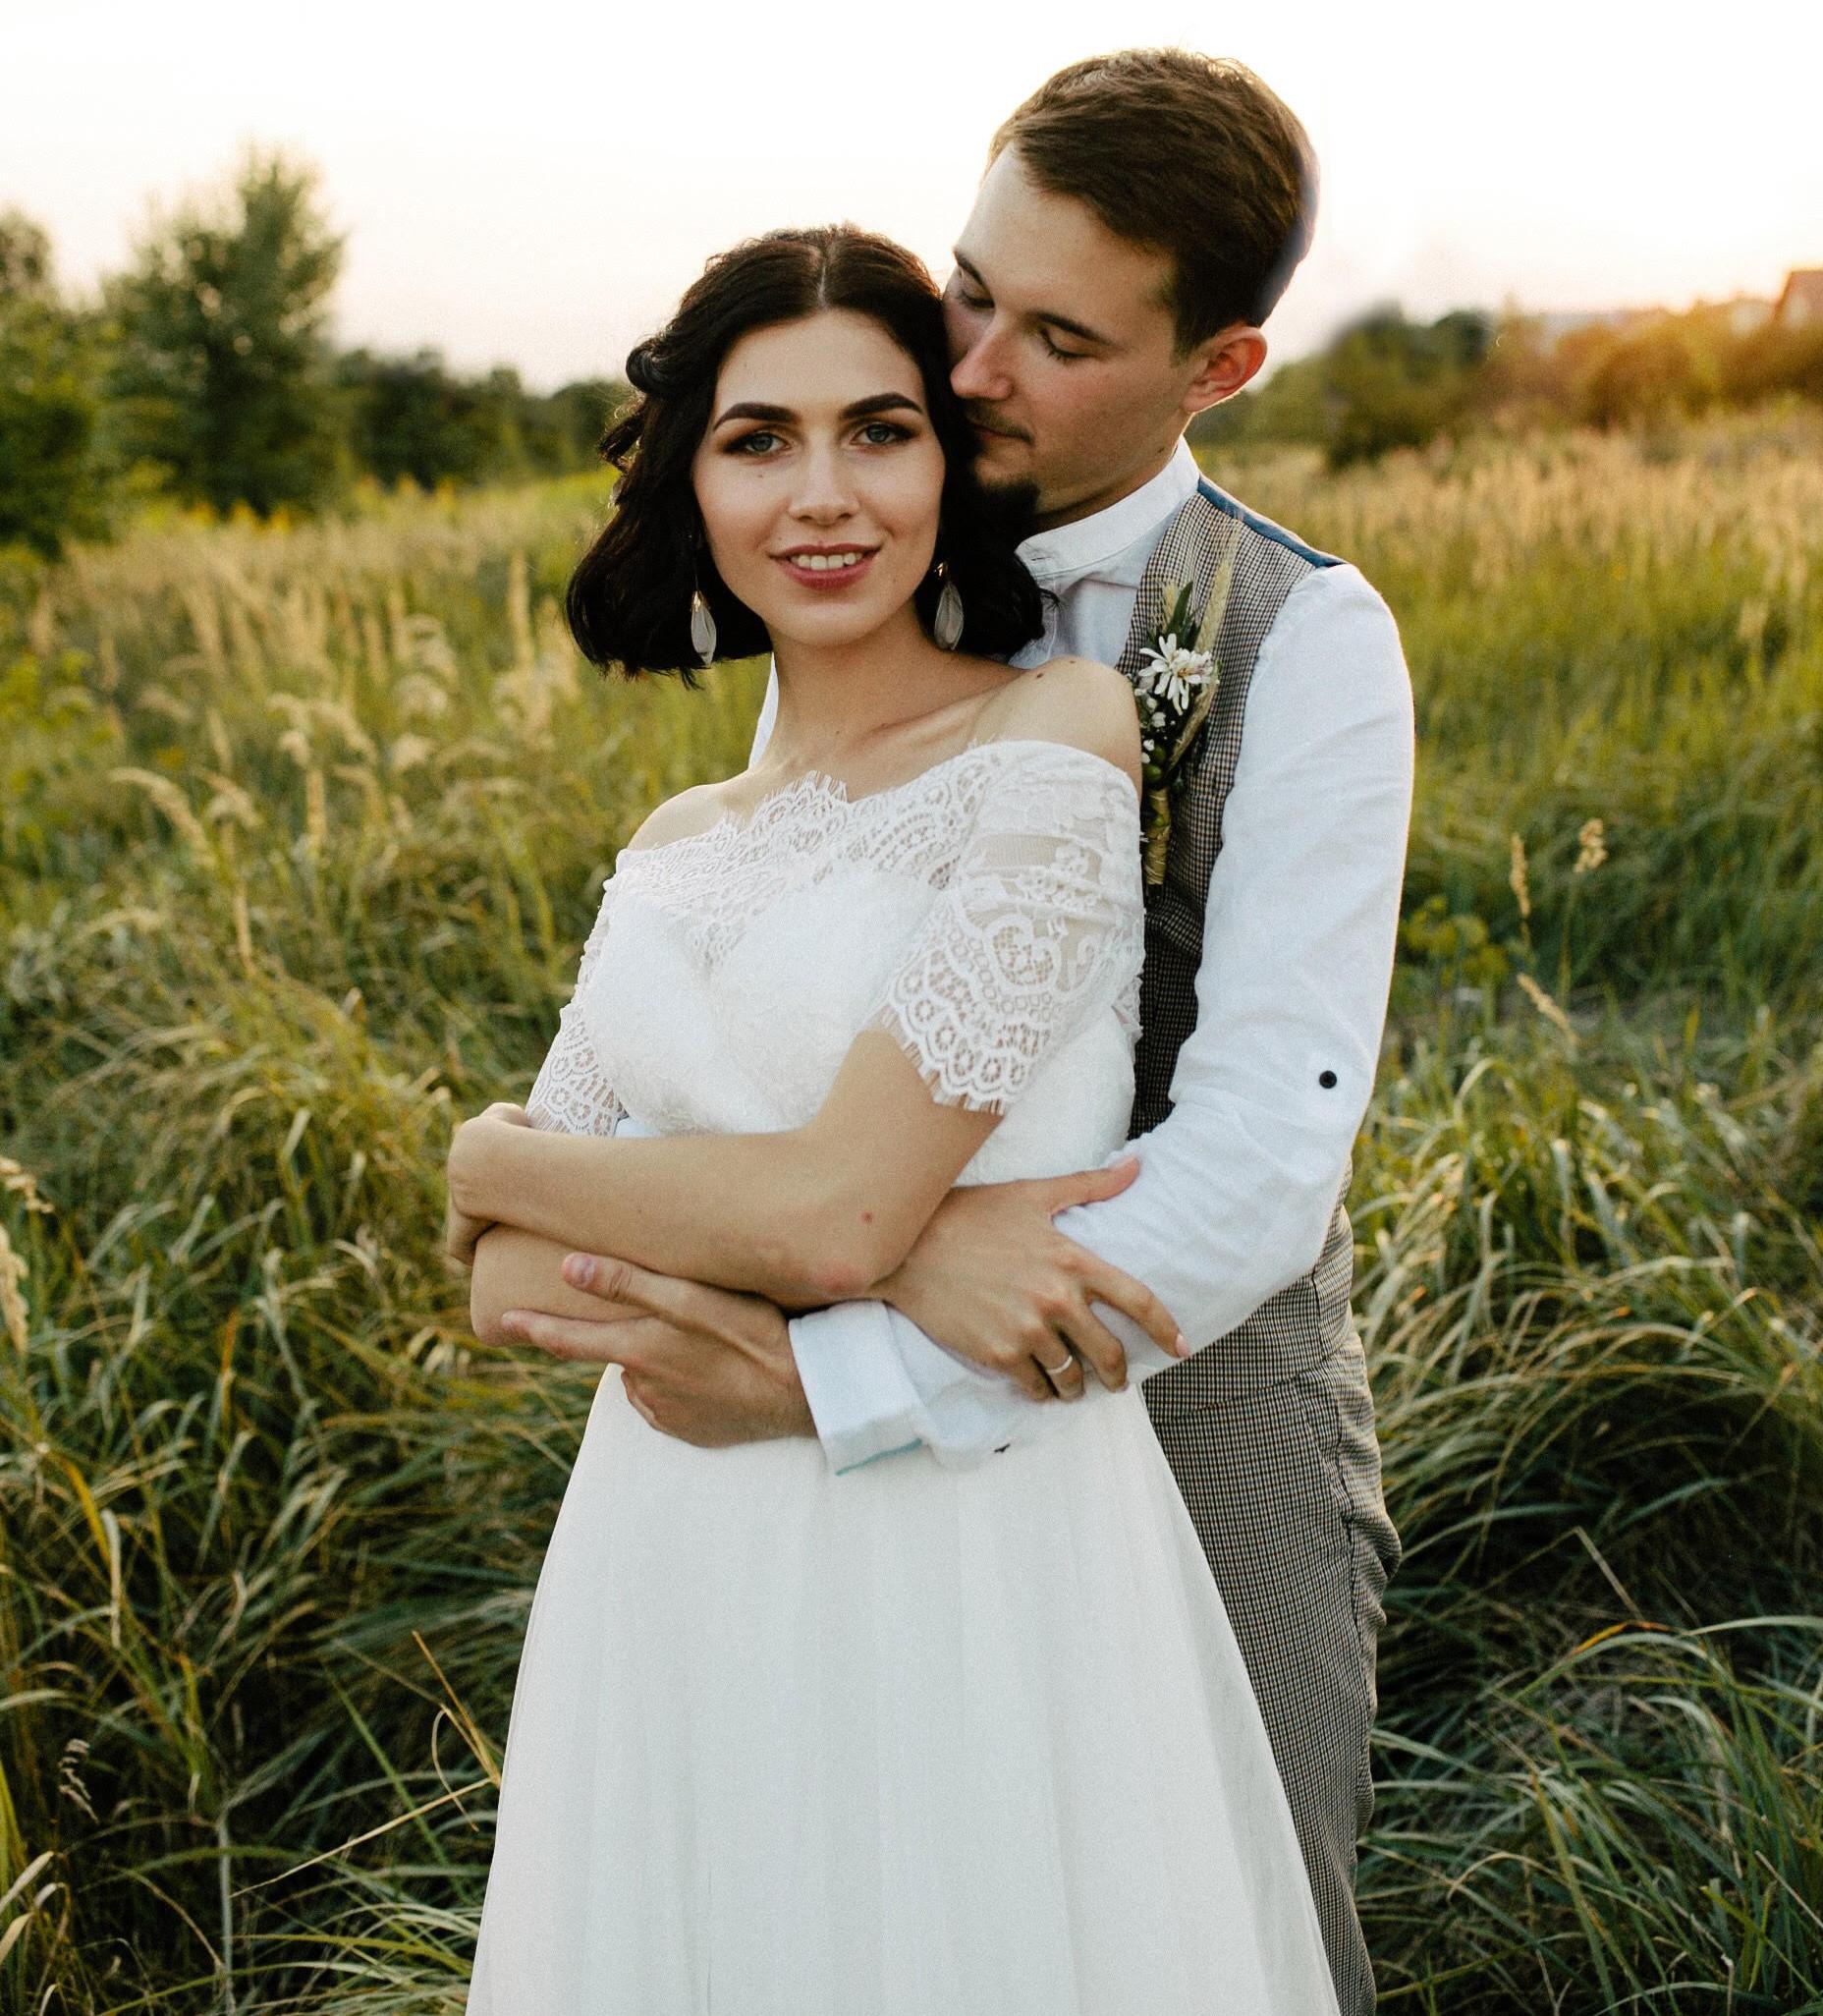 JJSHOUSE REAL WEDDING —— Asia & Mark   The Fashion Blog ...